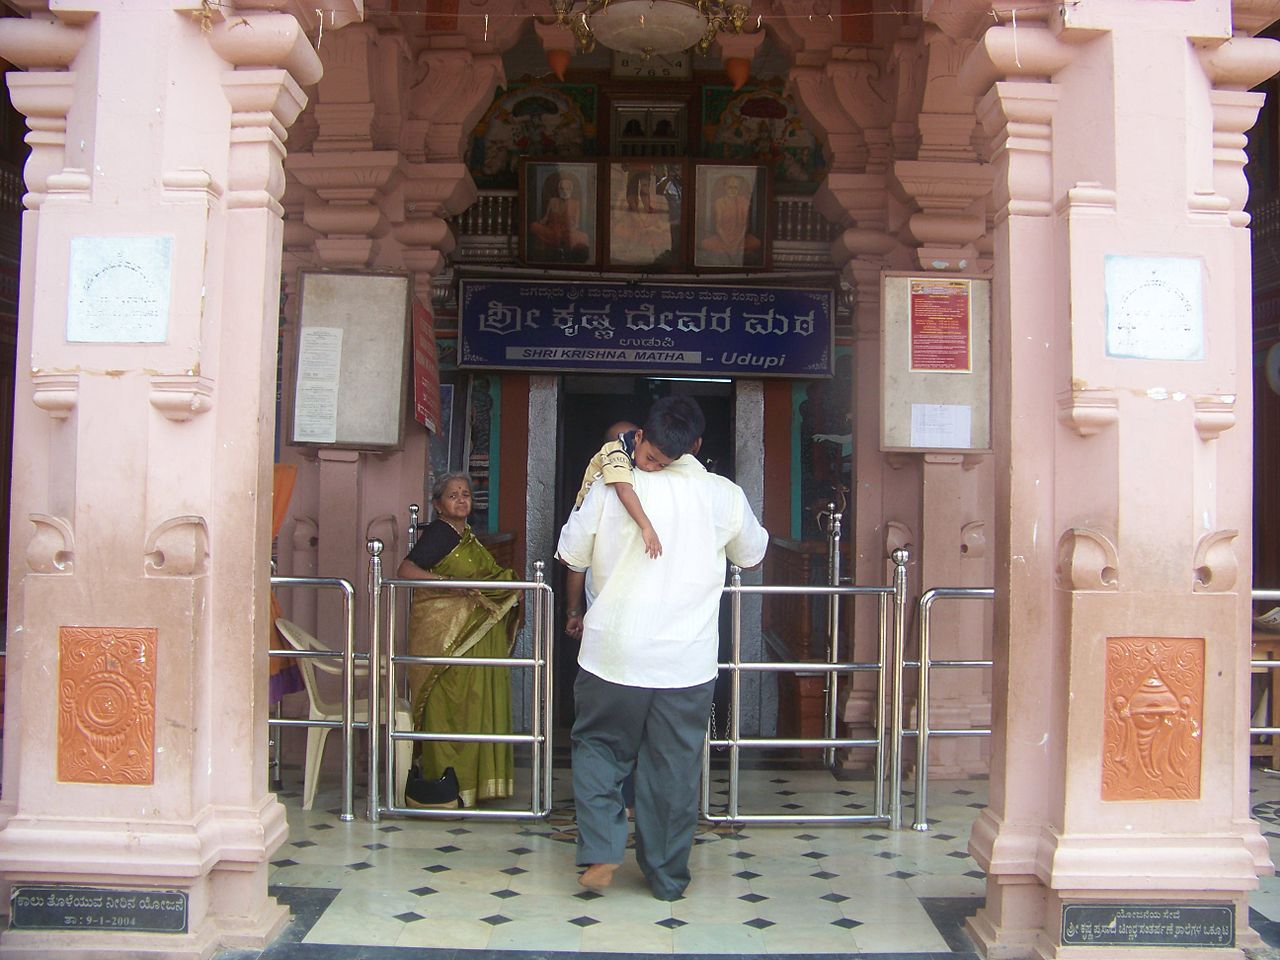 Idol of Krishna Temple In Udupi, Karnataka